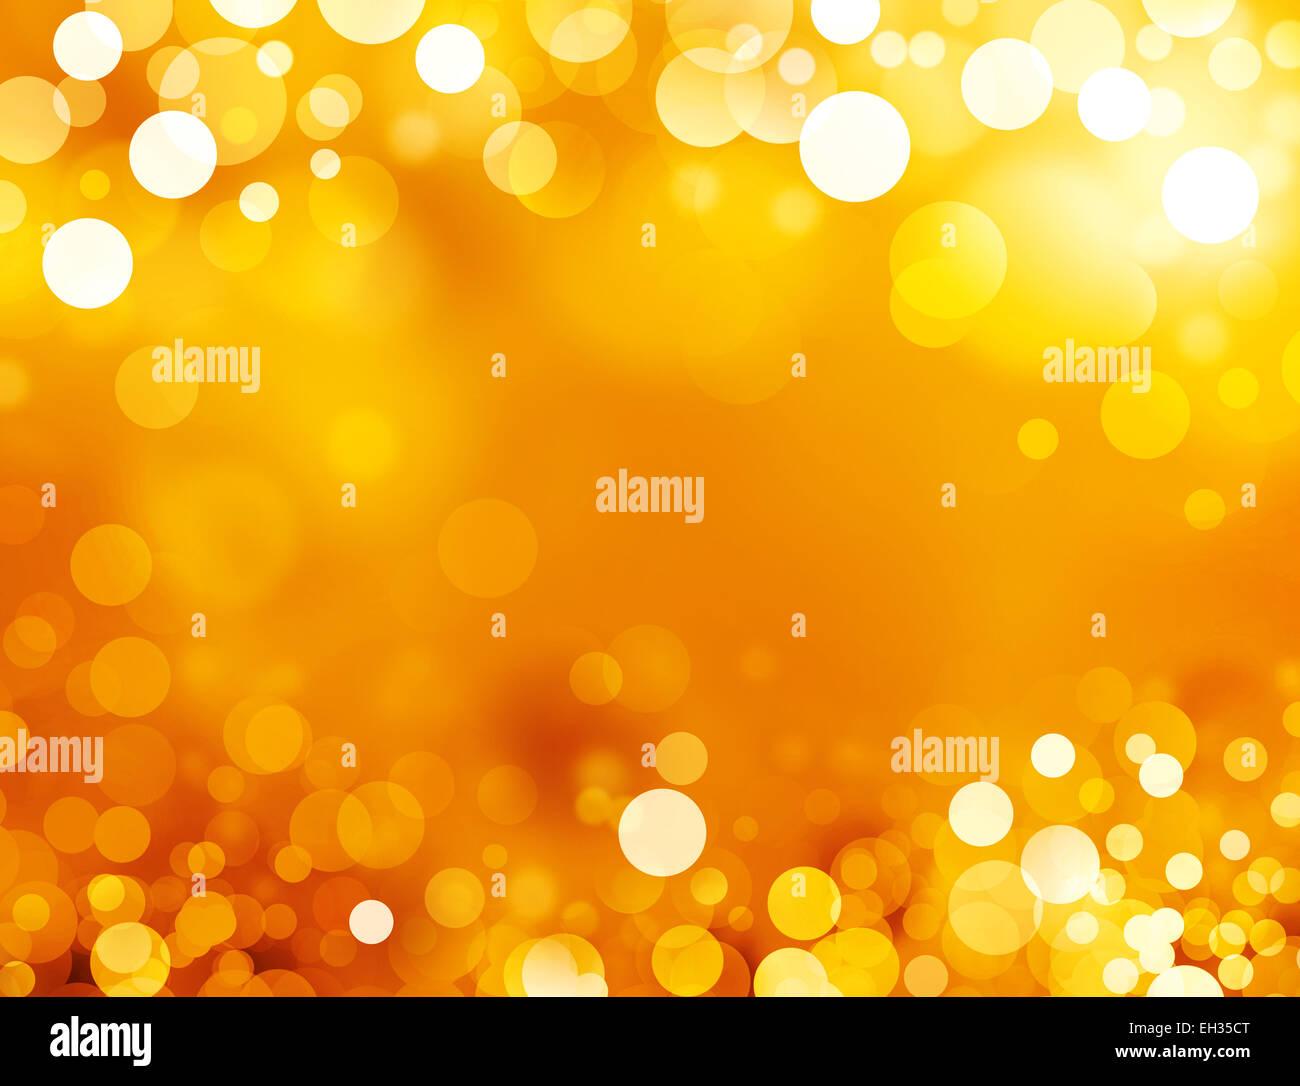 shiny golden lights stock - photo #10